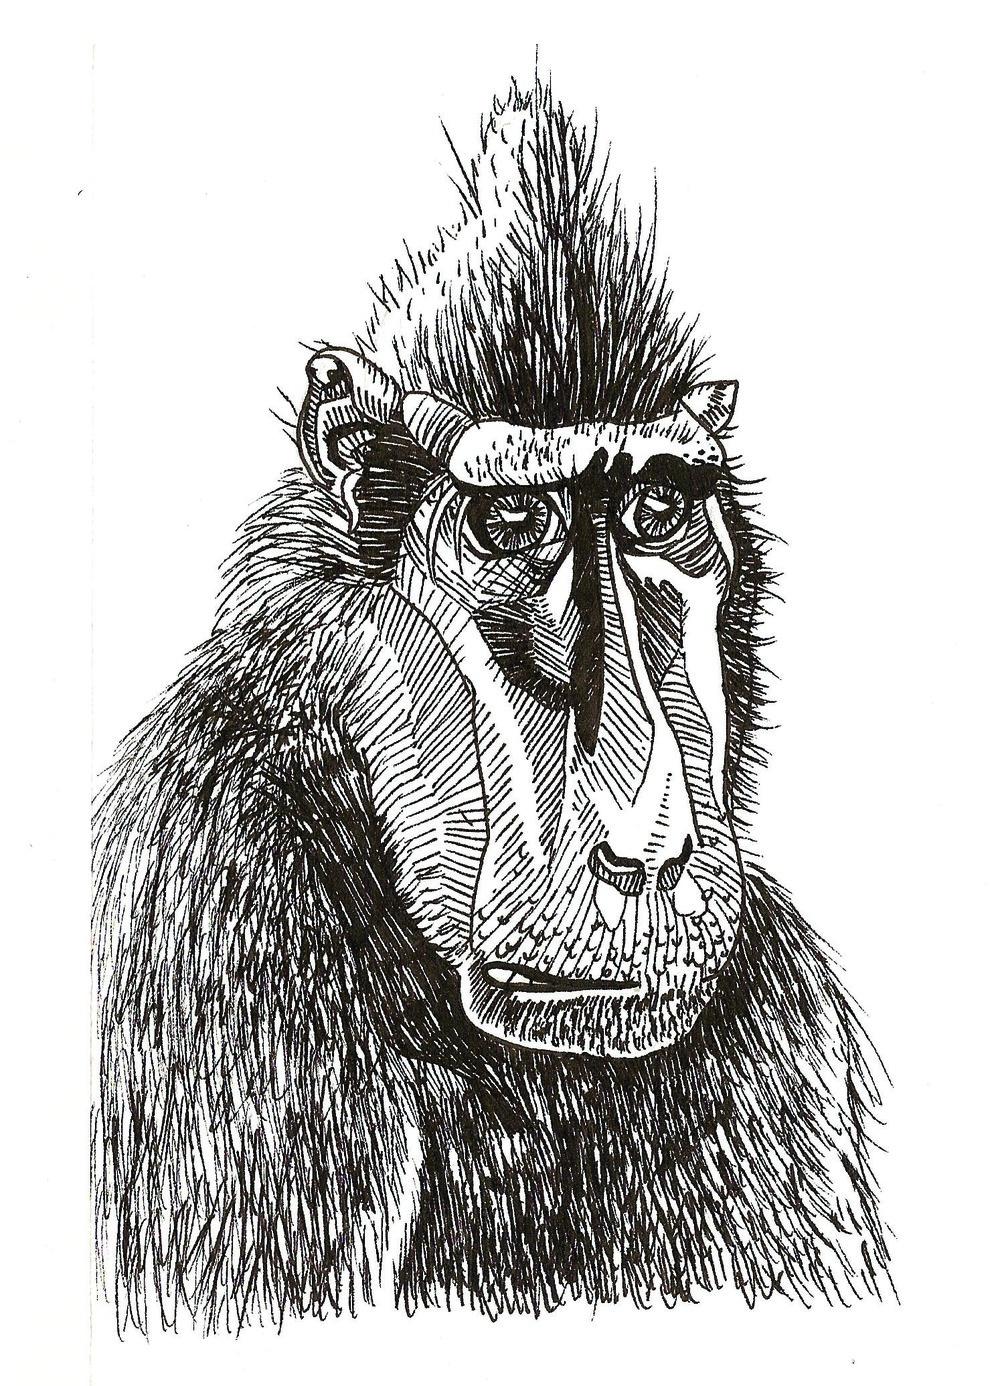 Monkey    H U M A N  A N C E S T O R